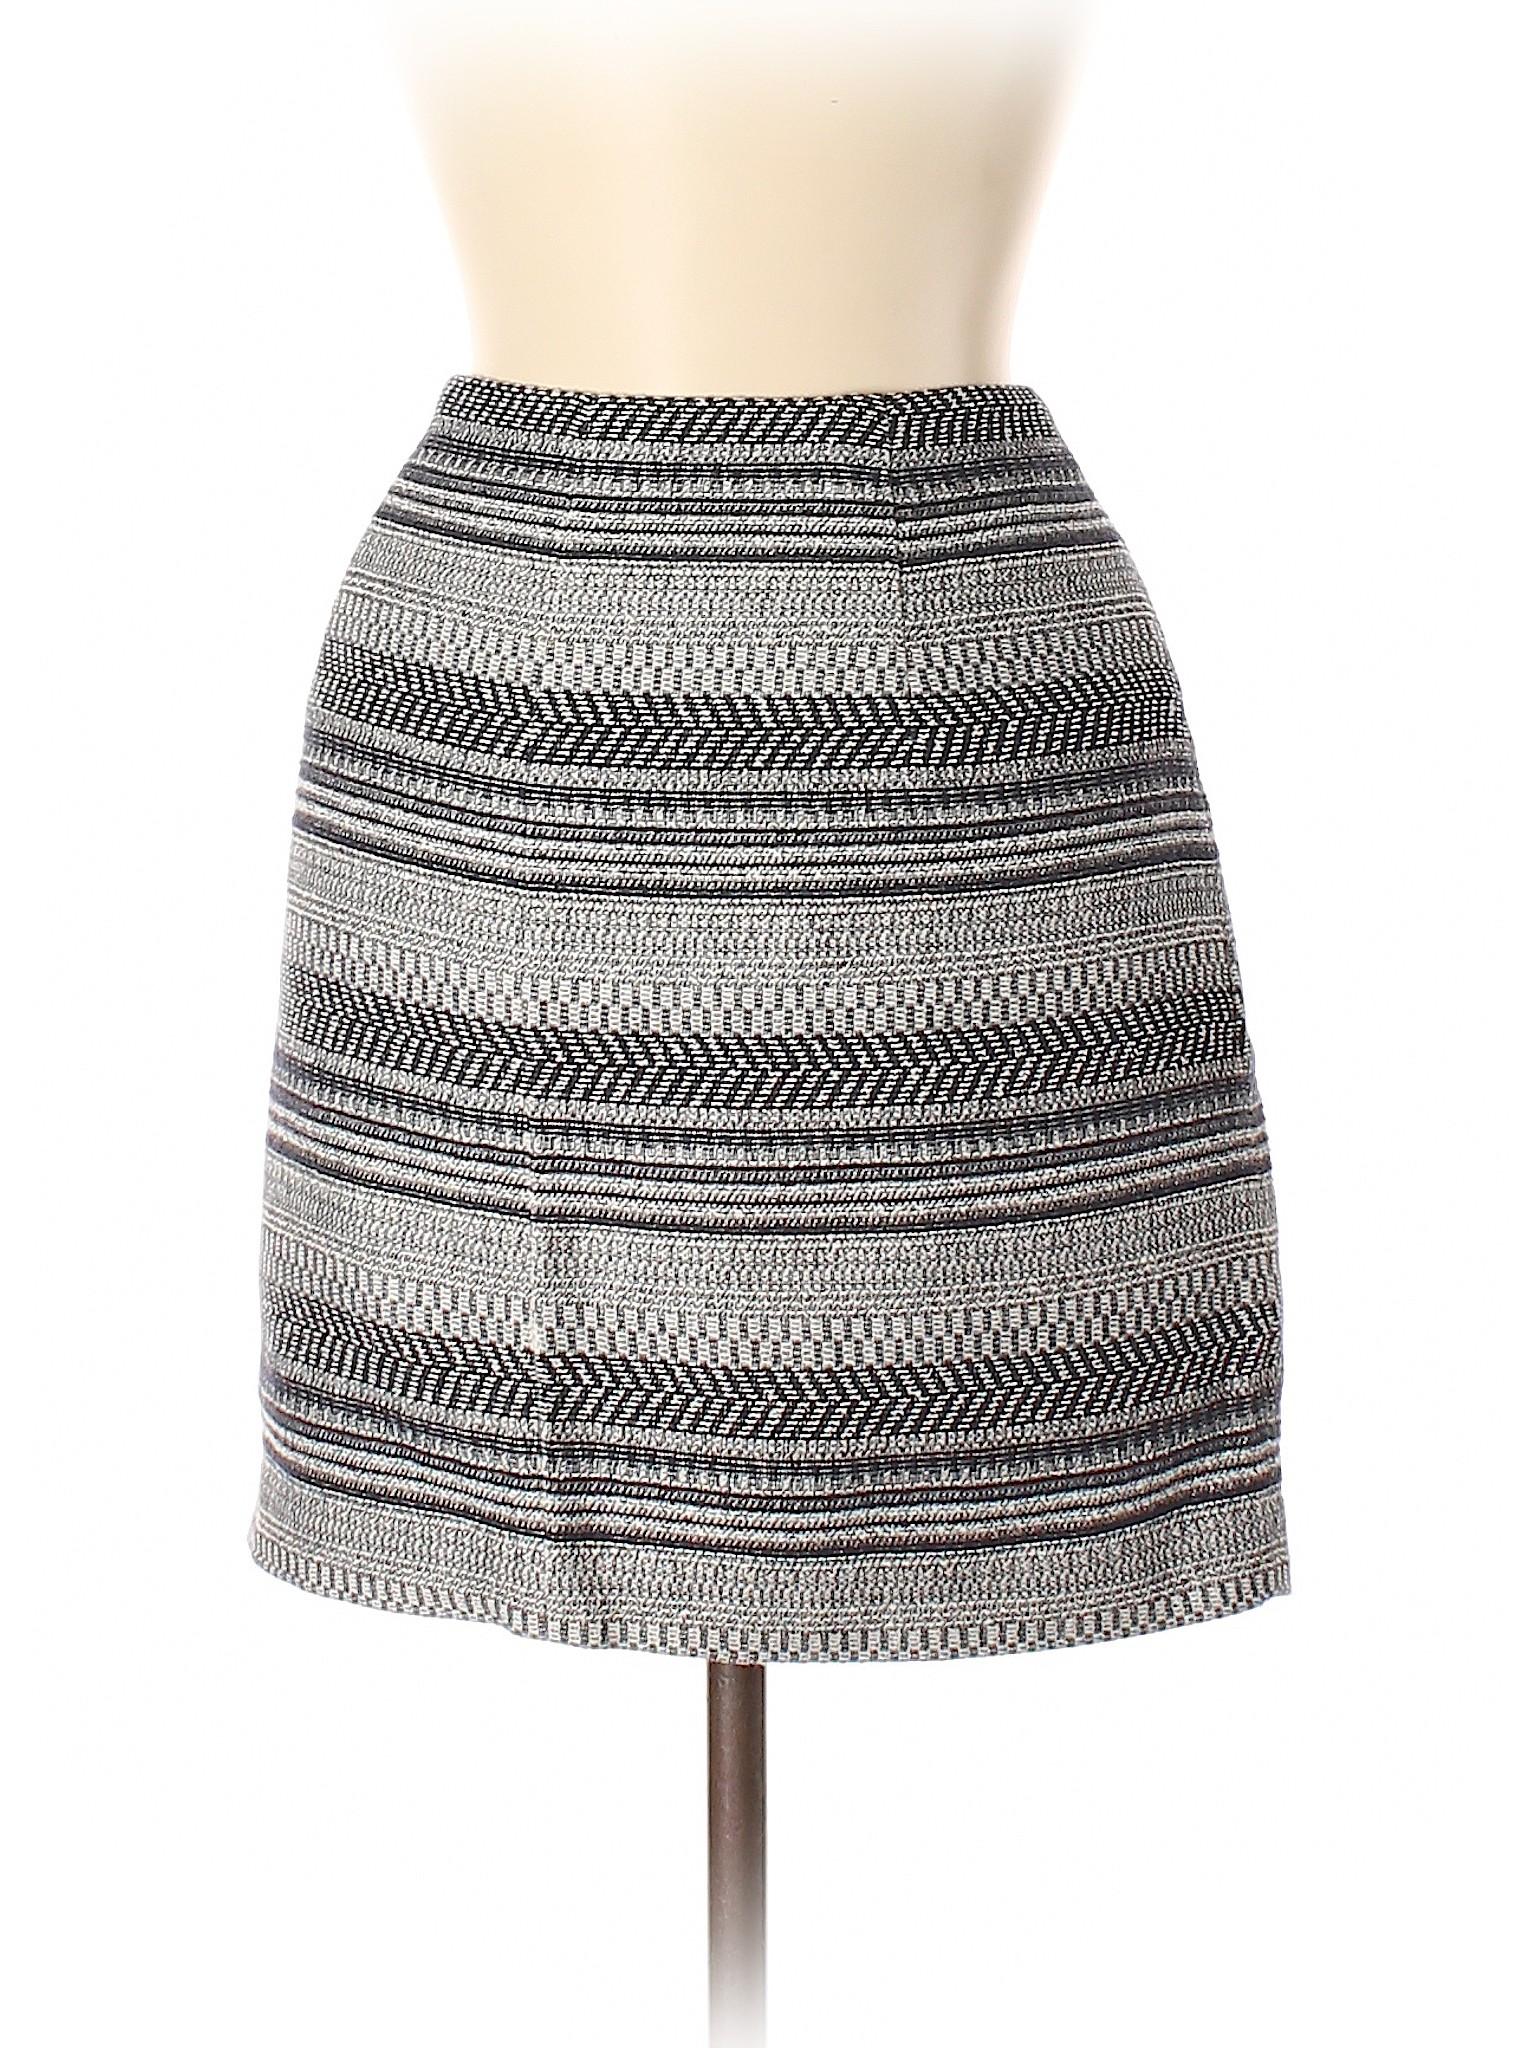 Store Banana Boutique Skirt Leisure Casual Republic Factory FxI5HwUI